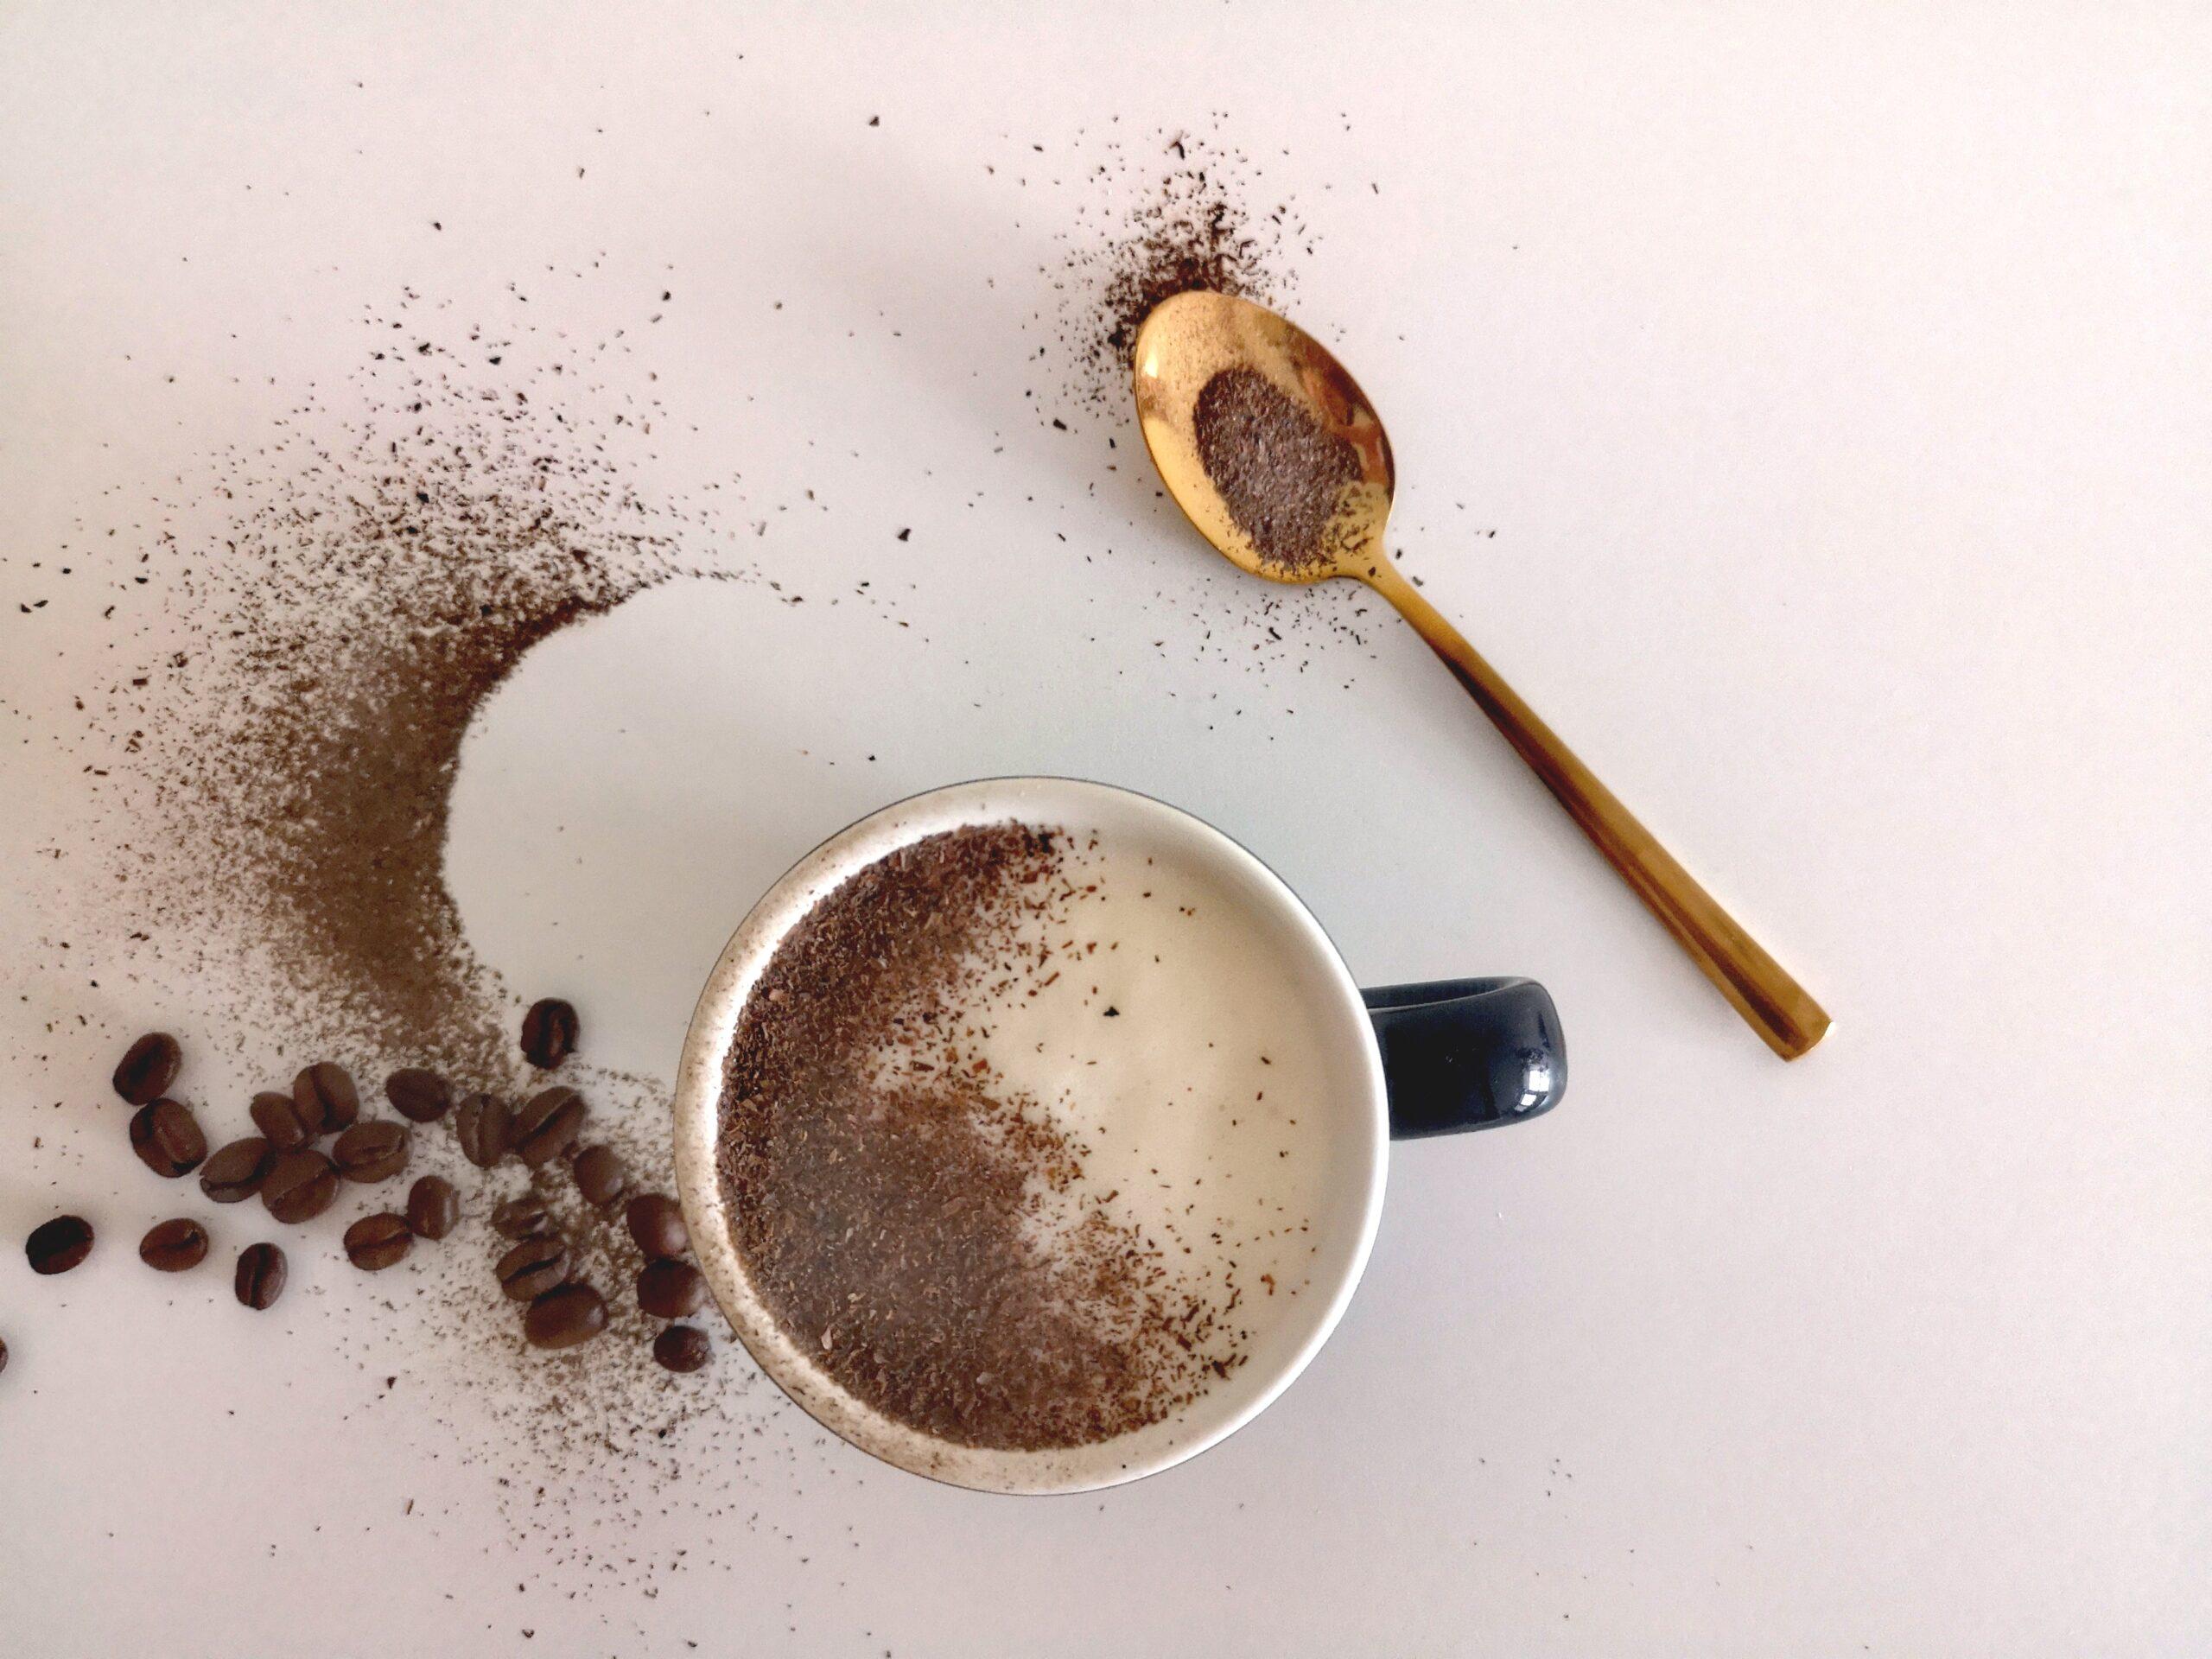 Kawa po królewsku